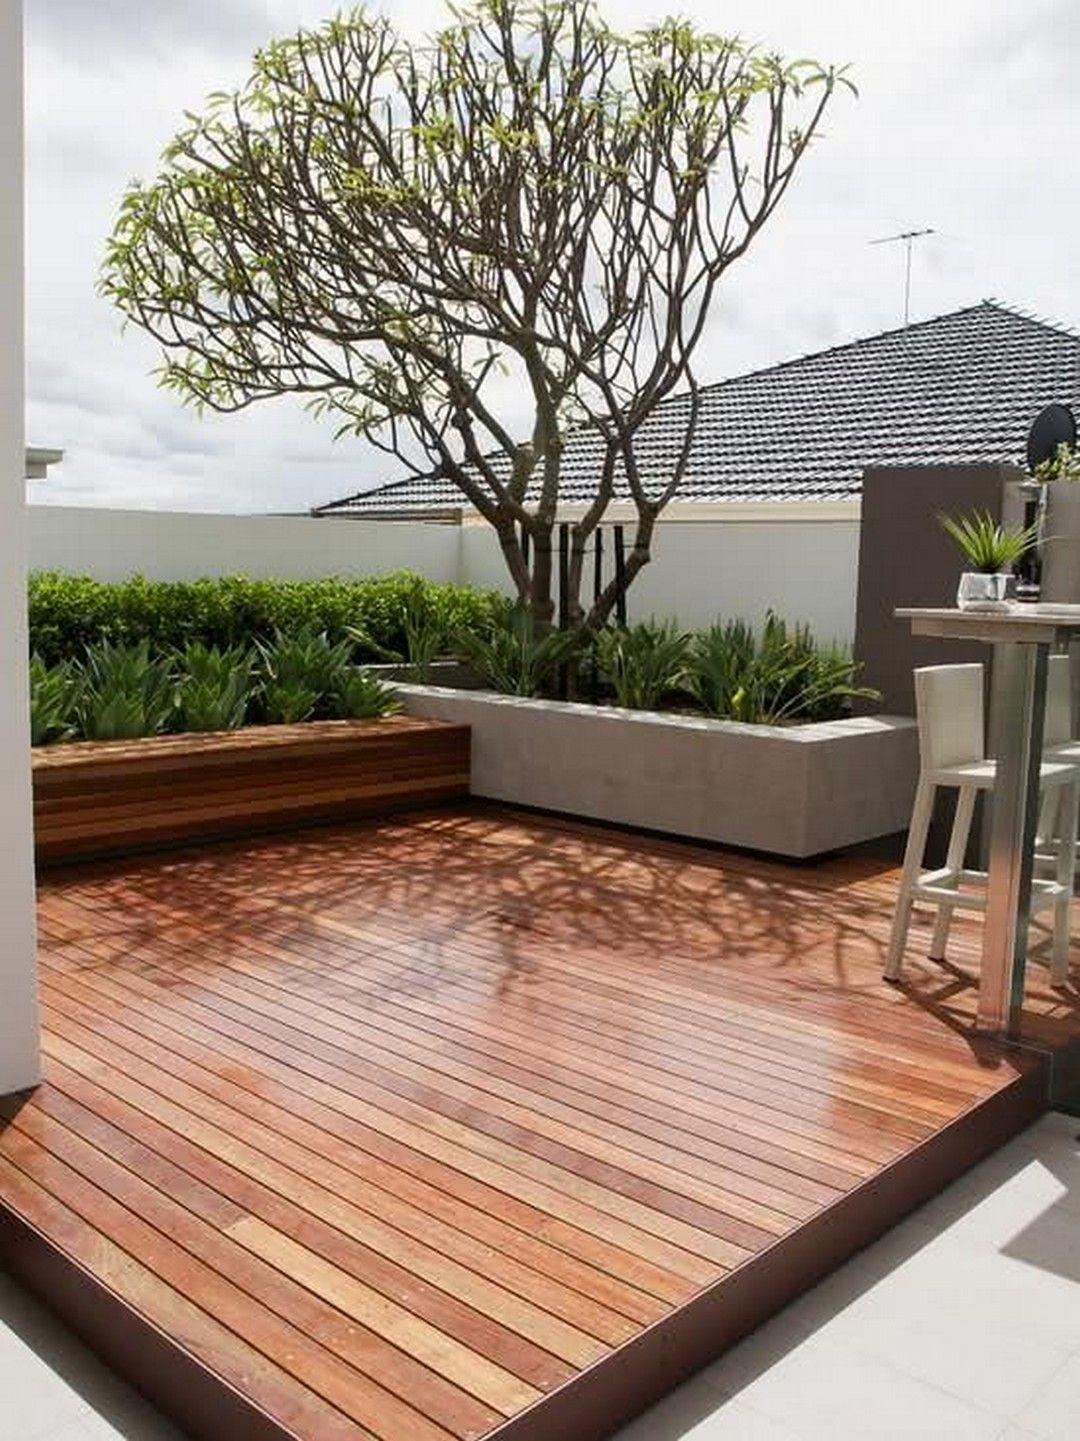 Costruire Tetto In Cemento 41 amazing modern deck designs for your backyard space (con